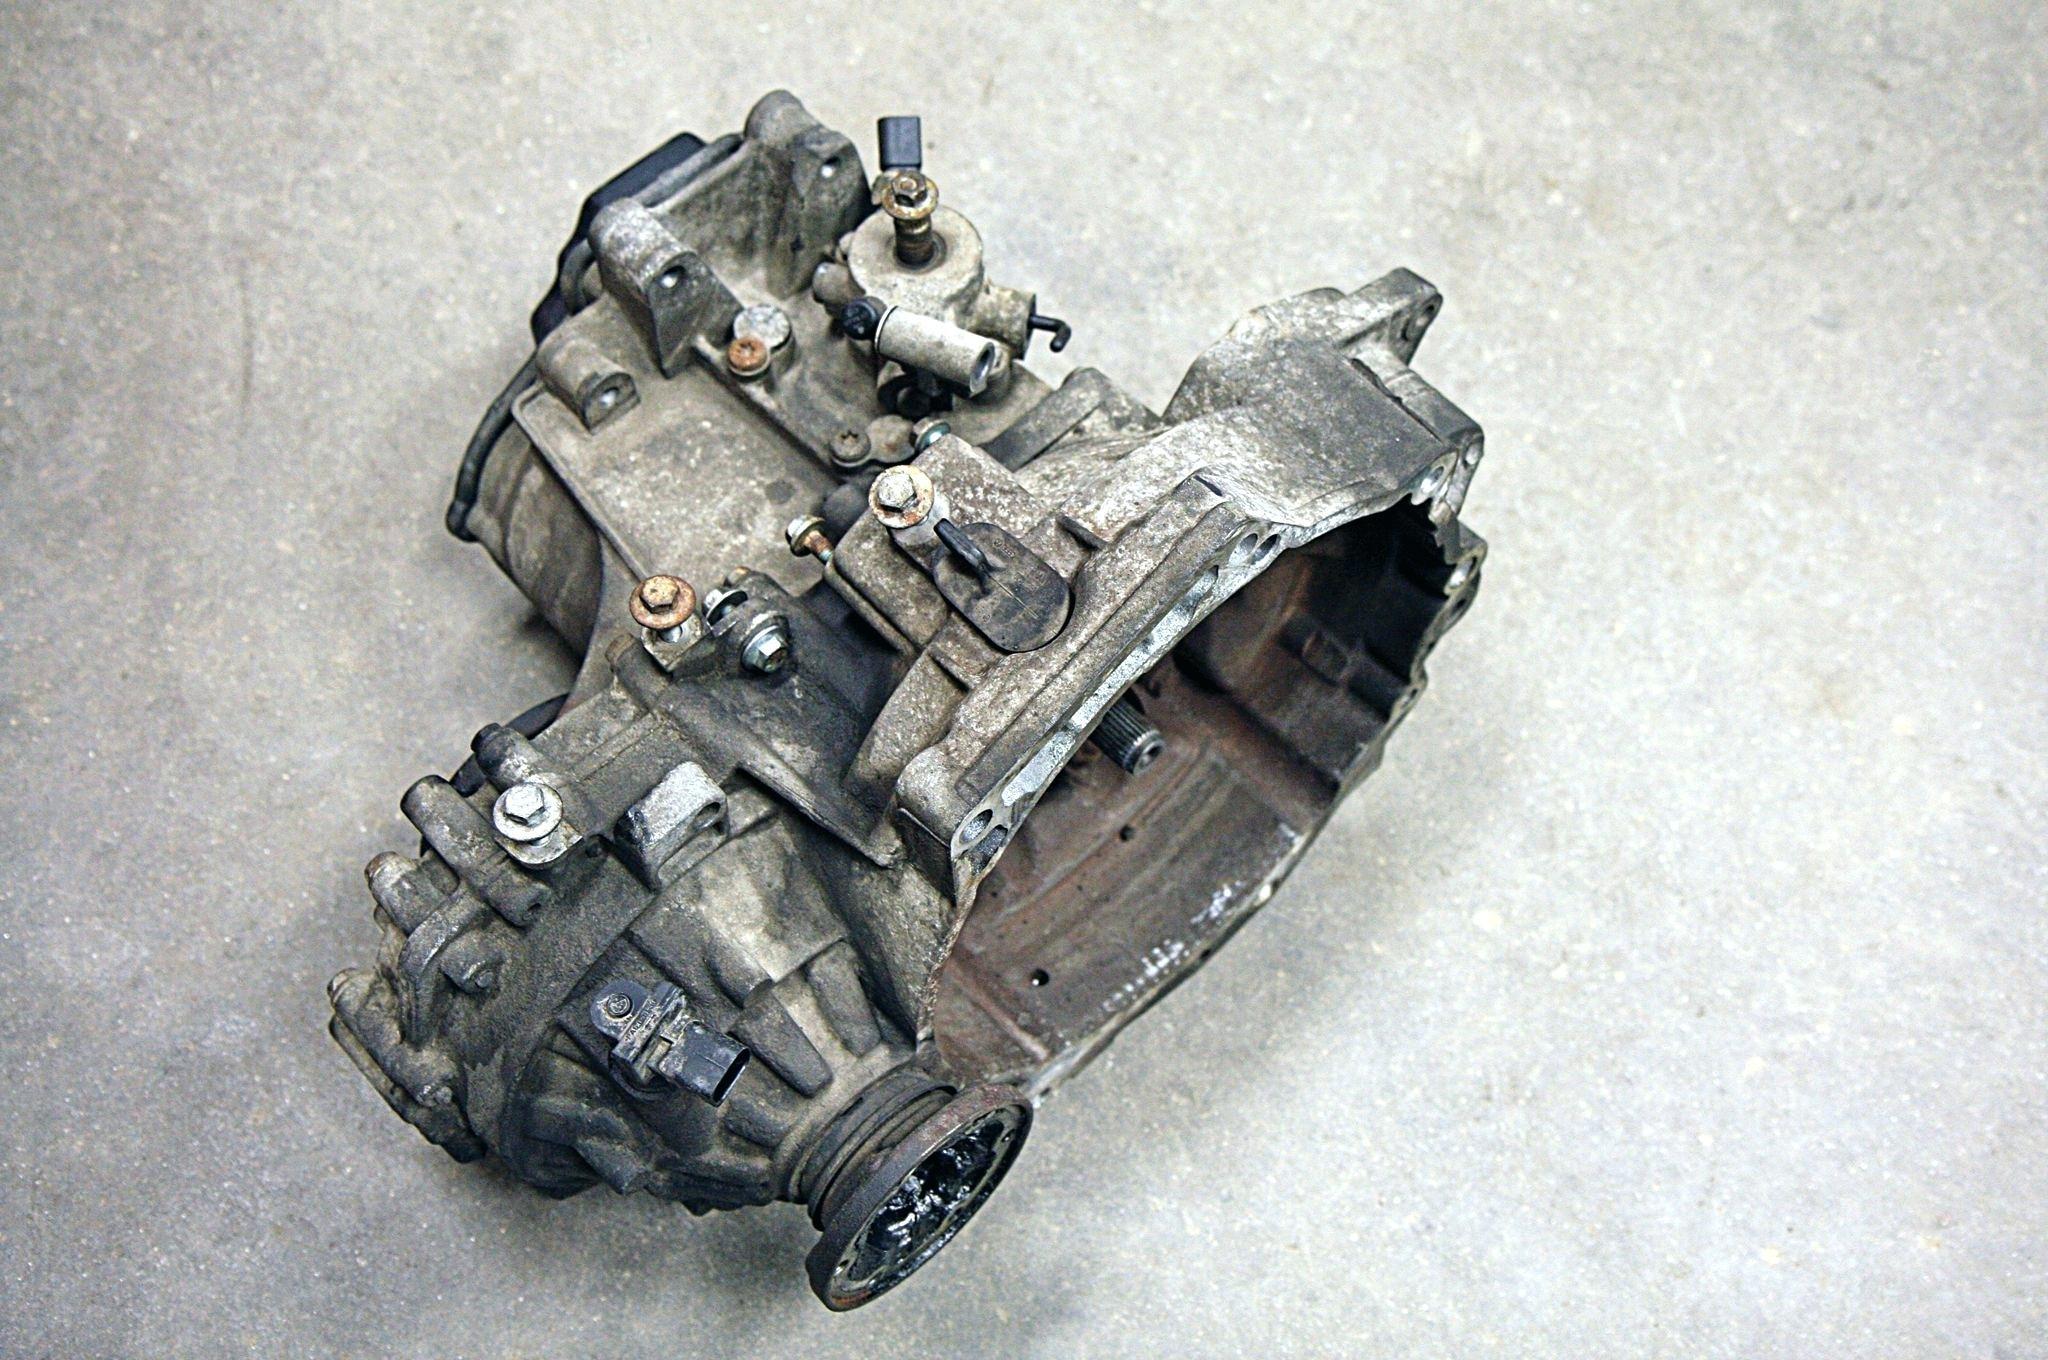 2000 Vw Jetta Vr6 Engine Diagram 2000 Vw Jetta Tdi Fuse Box Location Fever Part 1 Wiring Diagram Golf Of 2000 Vw Jetta Vr6 Engine Diagram